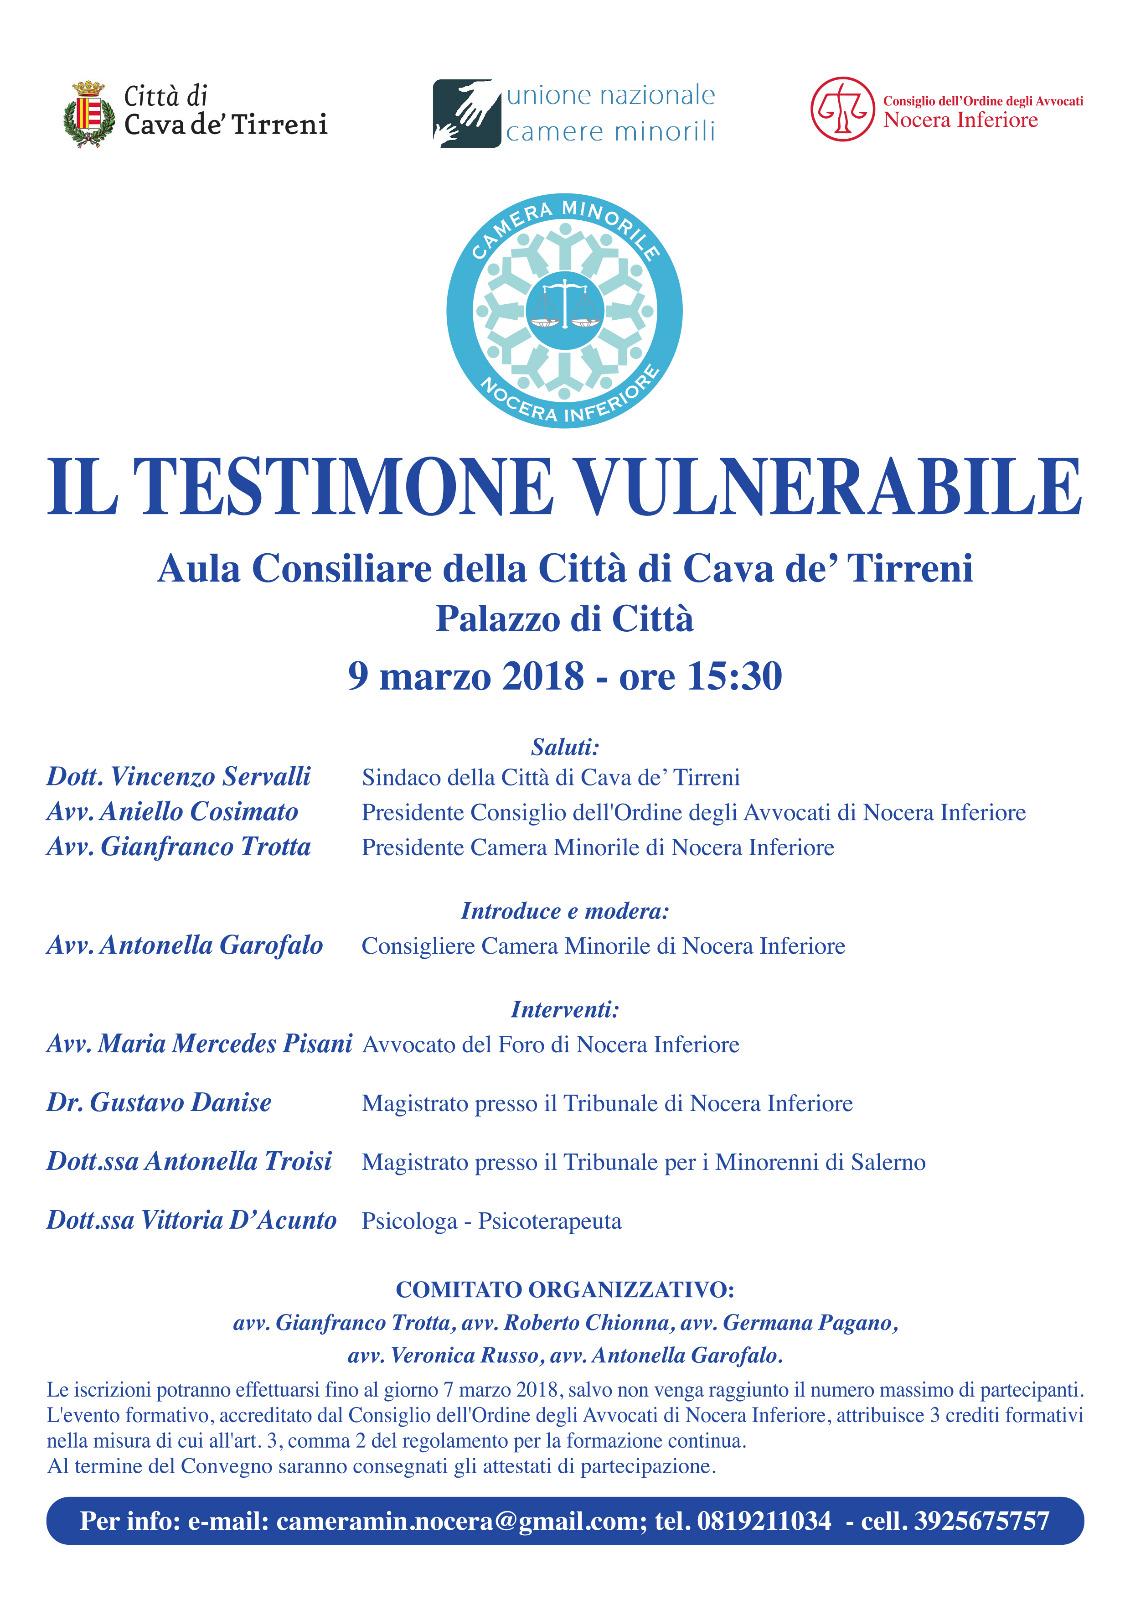 CM_Nocera_Inferiore_Testimone_Vulnerabile09_03_2018